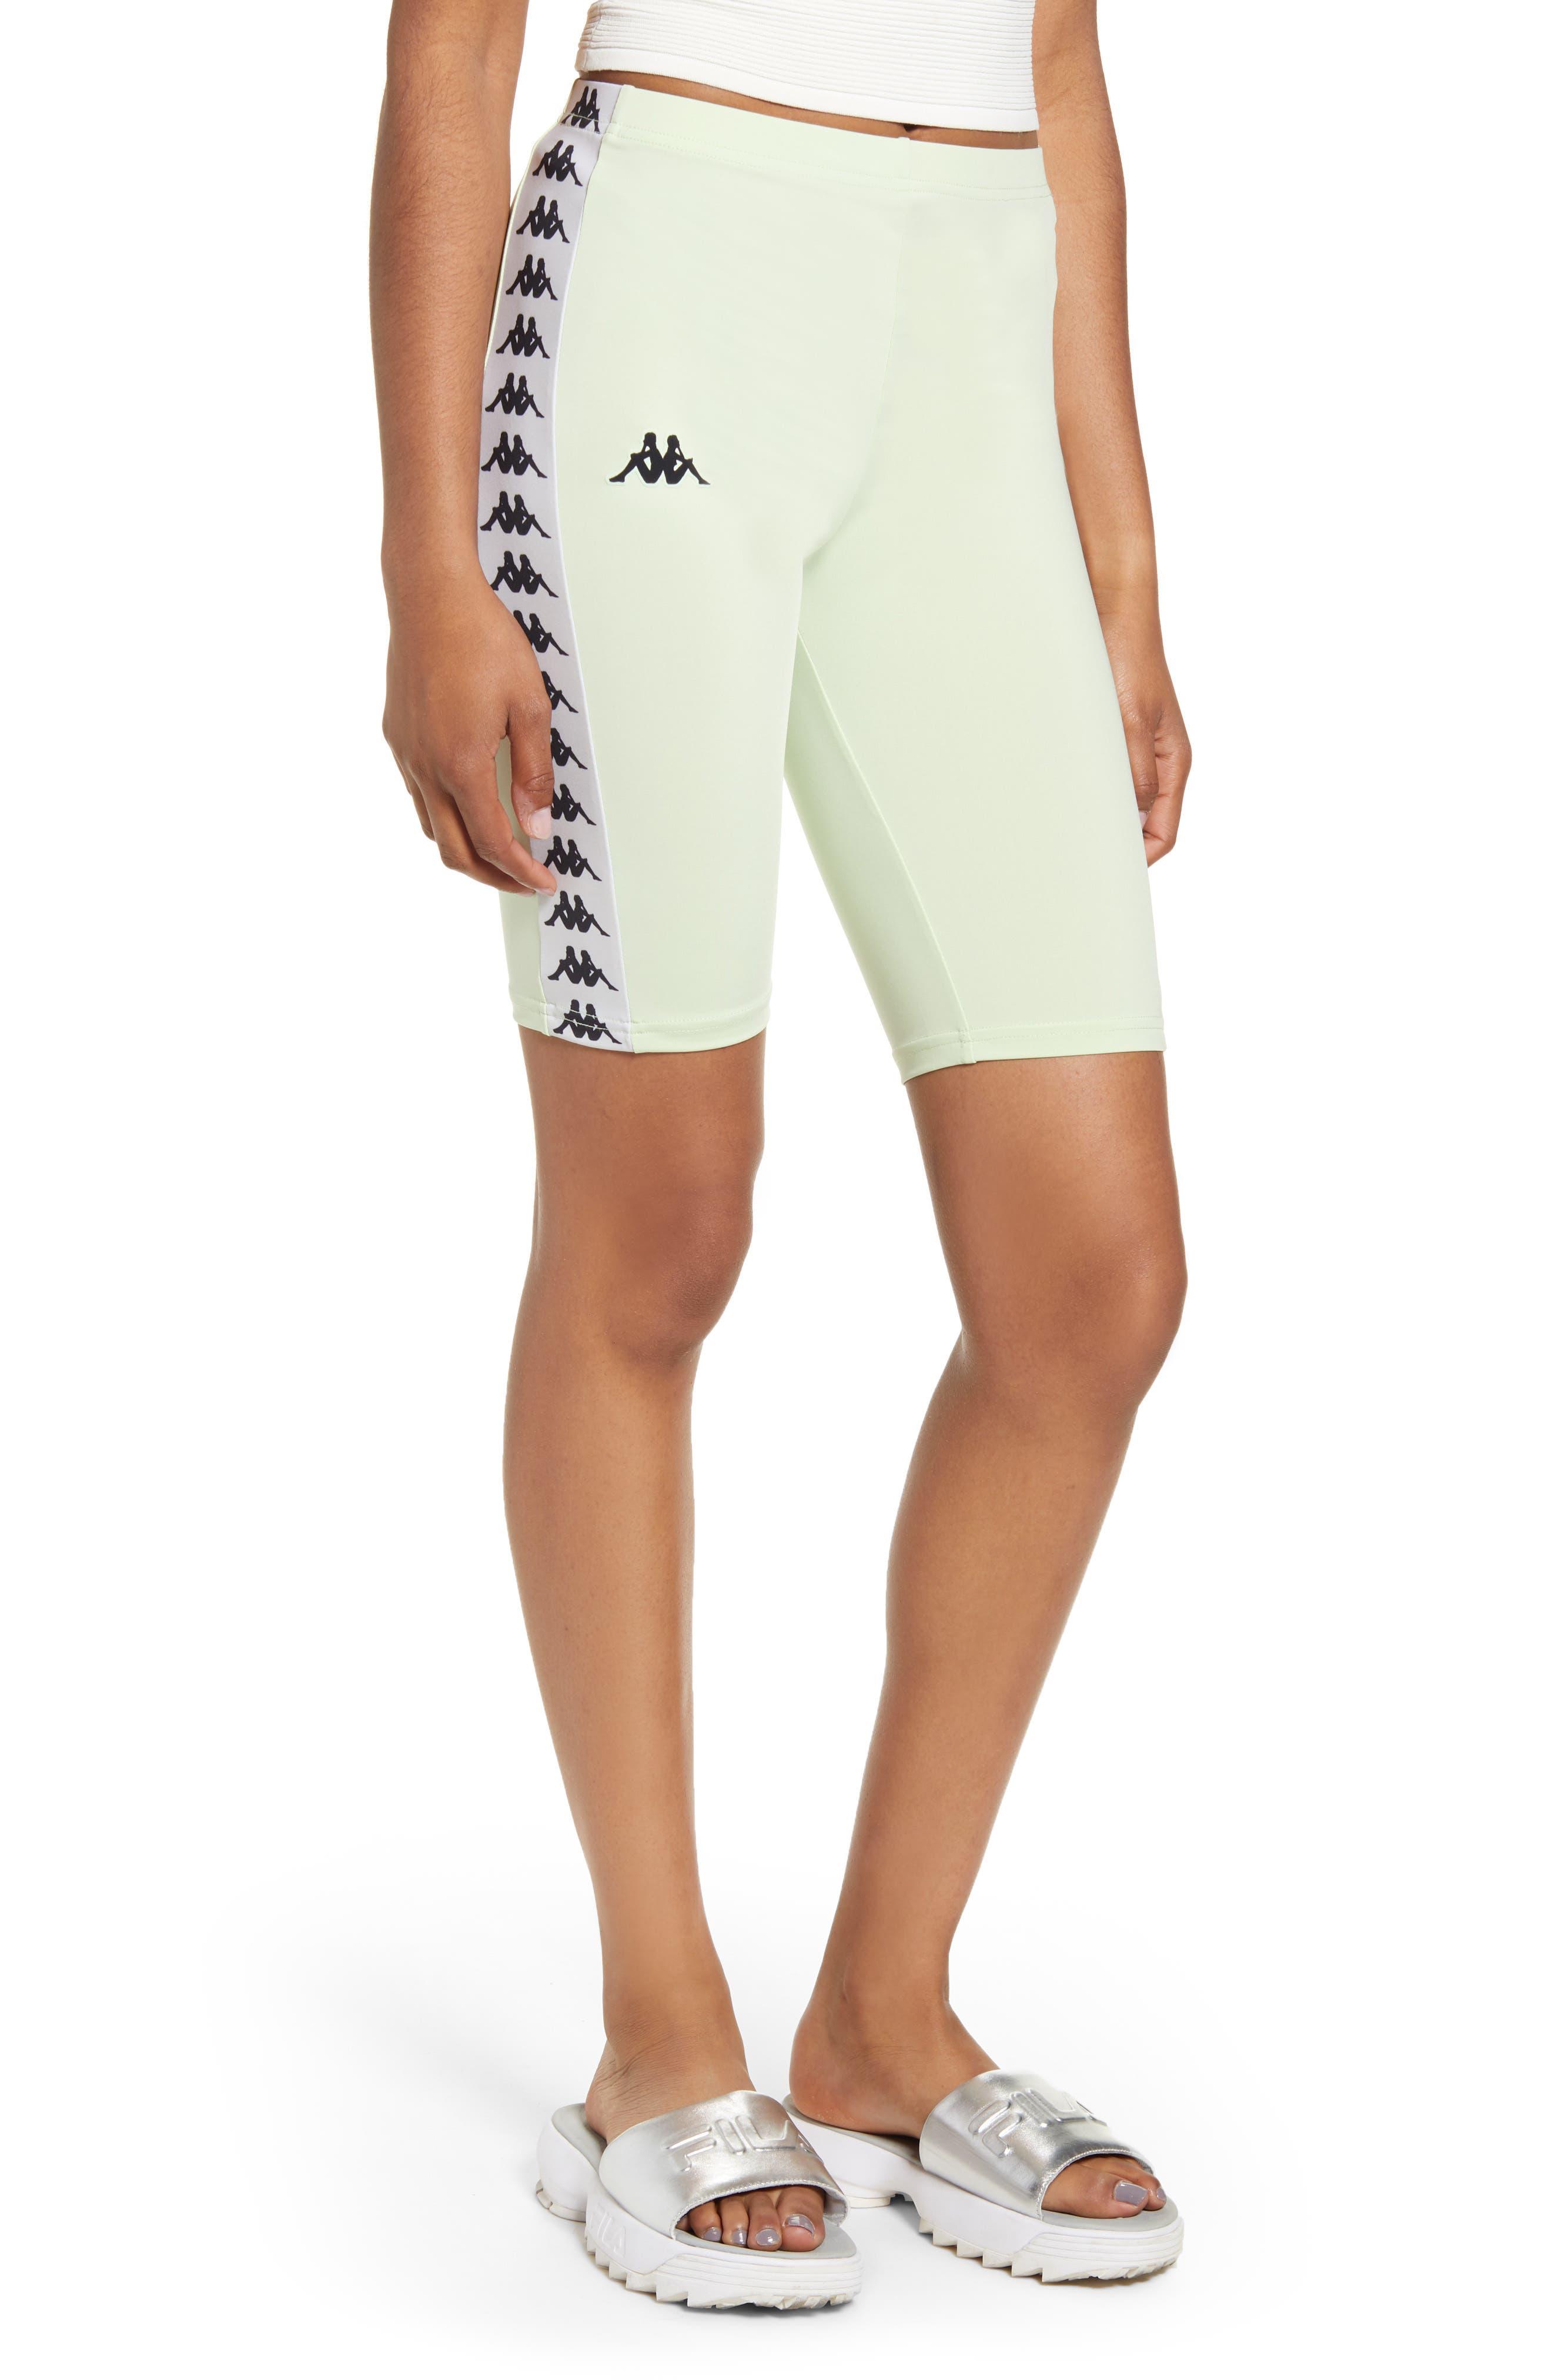 2d9374c1a7 Women's Kappa Clothing | Nordstrom